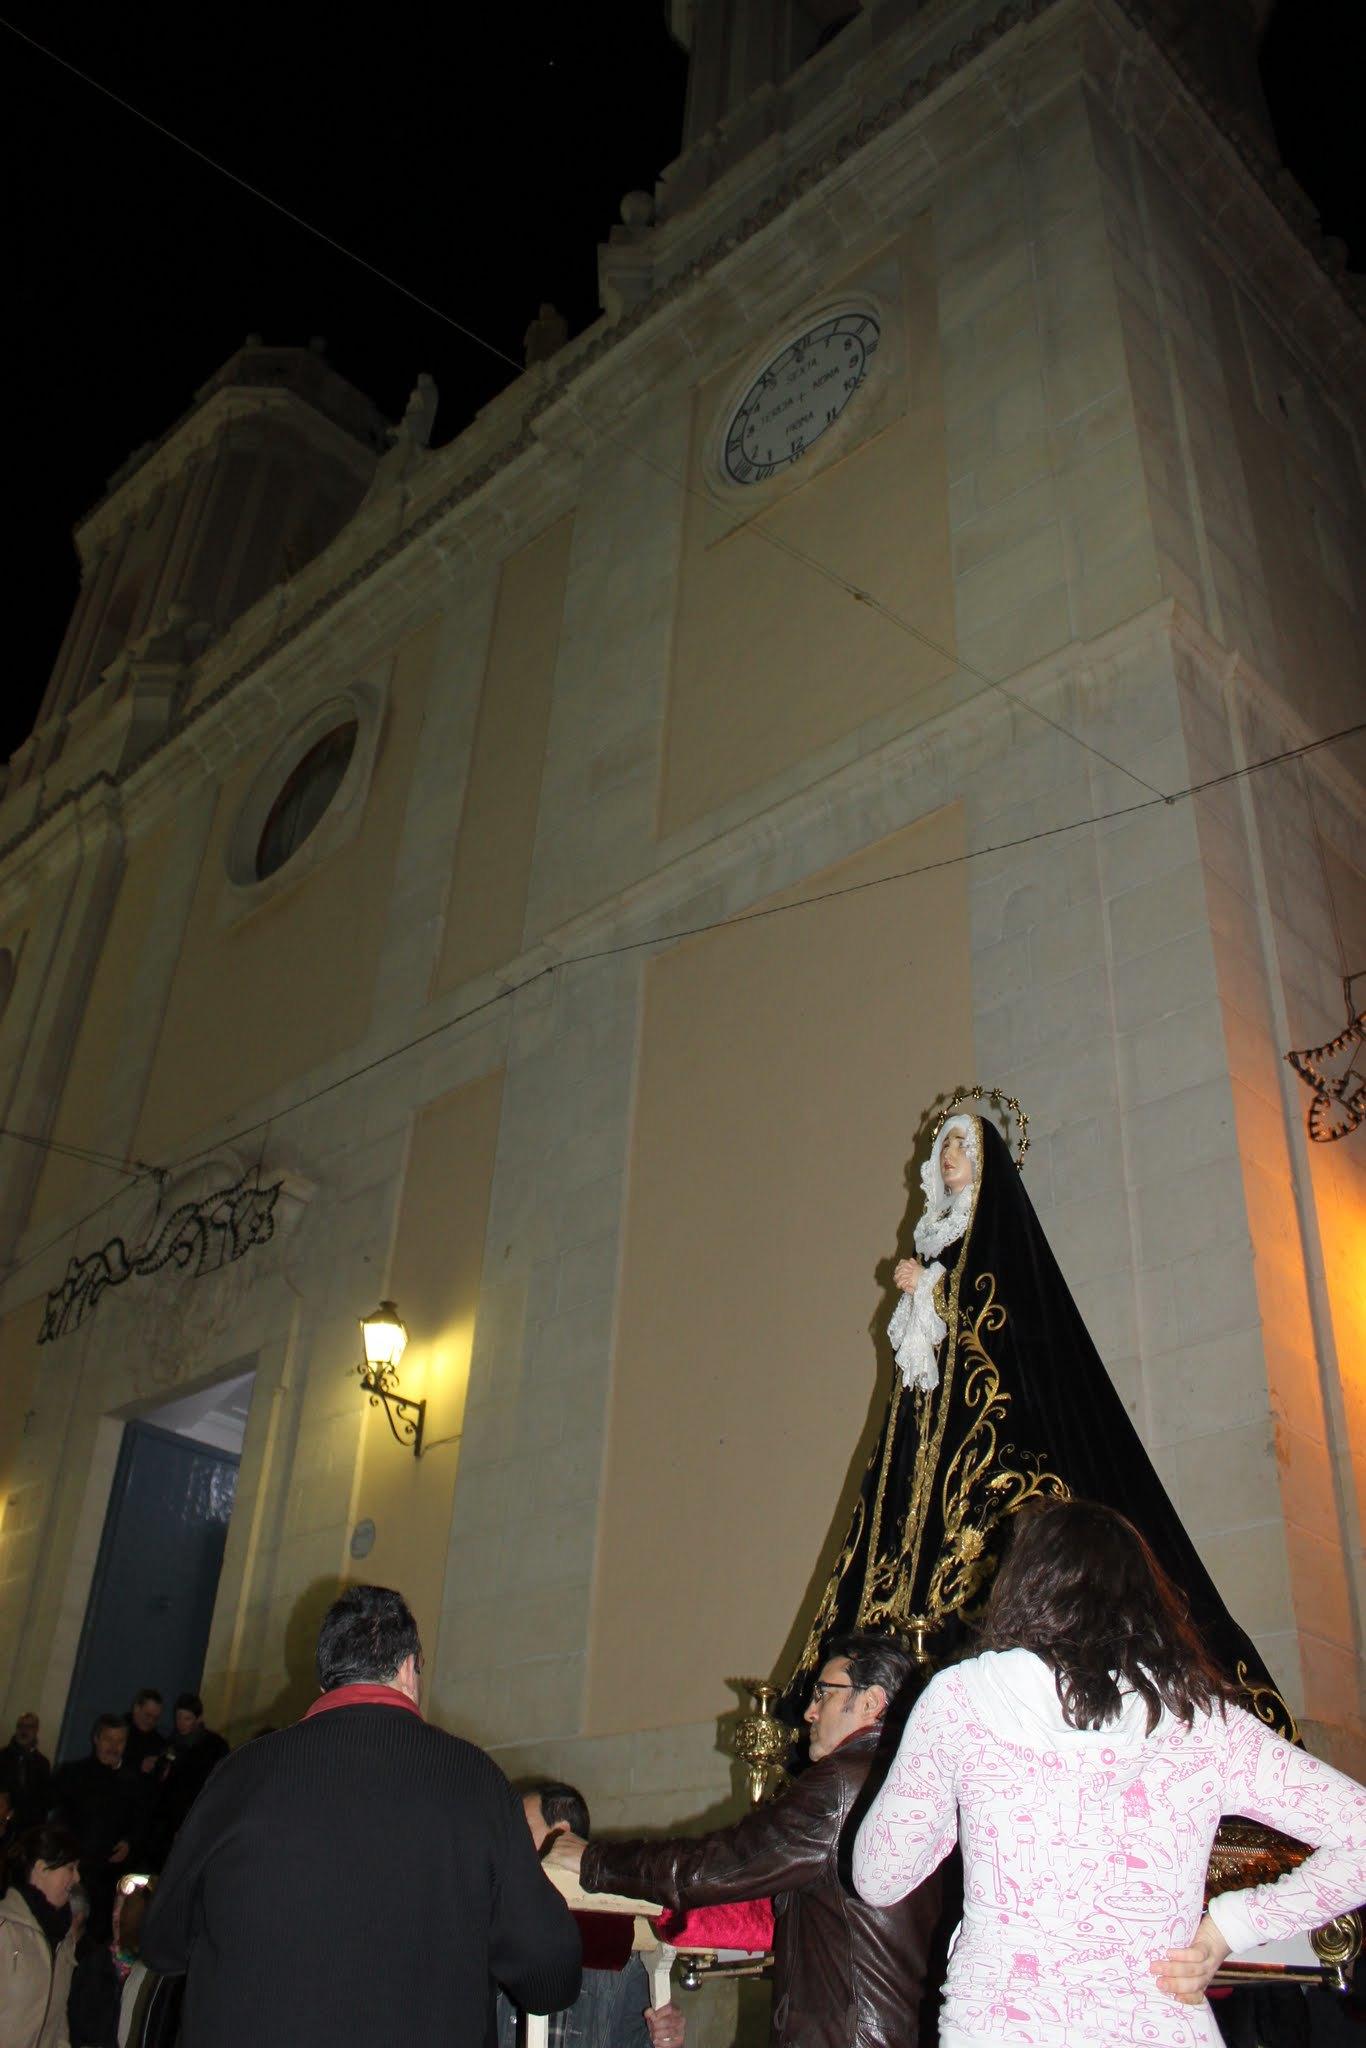 (2013-03-22) - IV Vía Crucis nocturno - Javier Romero Ripoll (128)